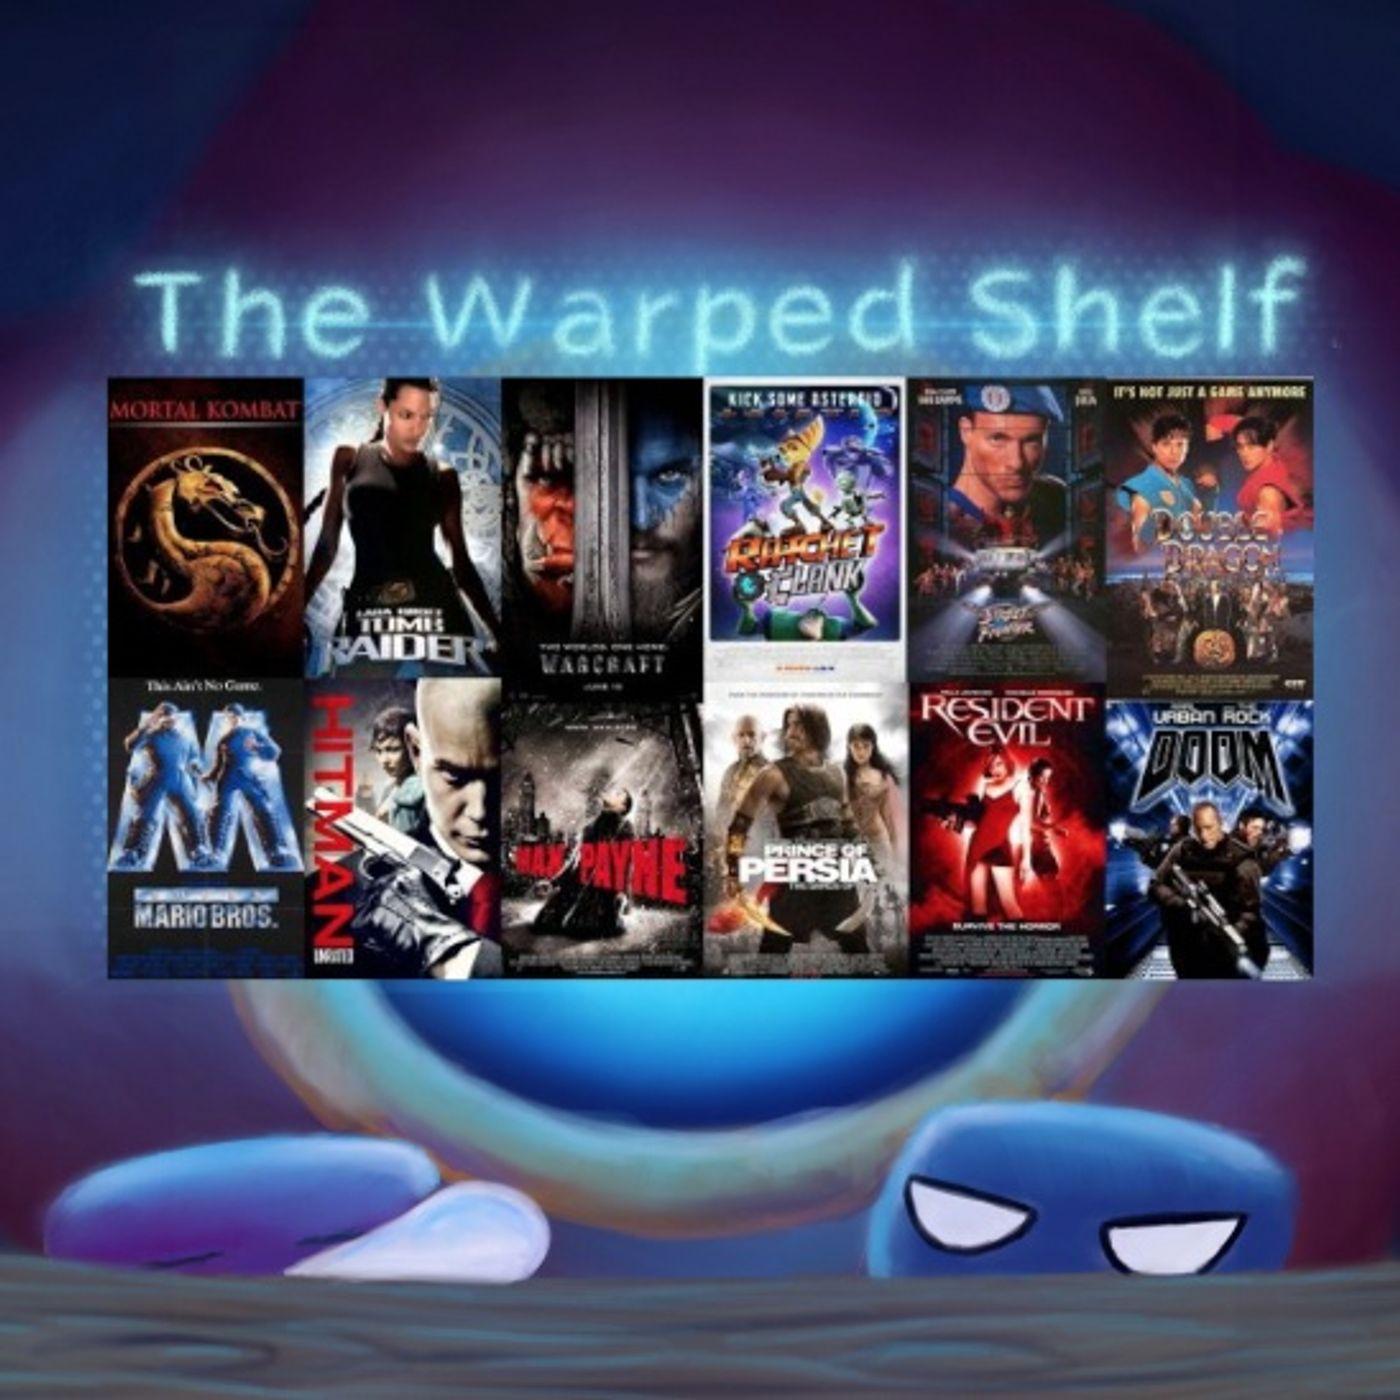 The Warped Shelf - Video Game Movies with Eddie McCabe